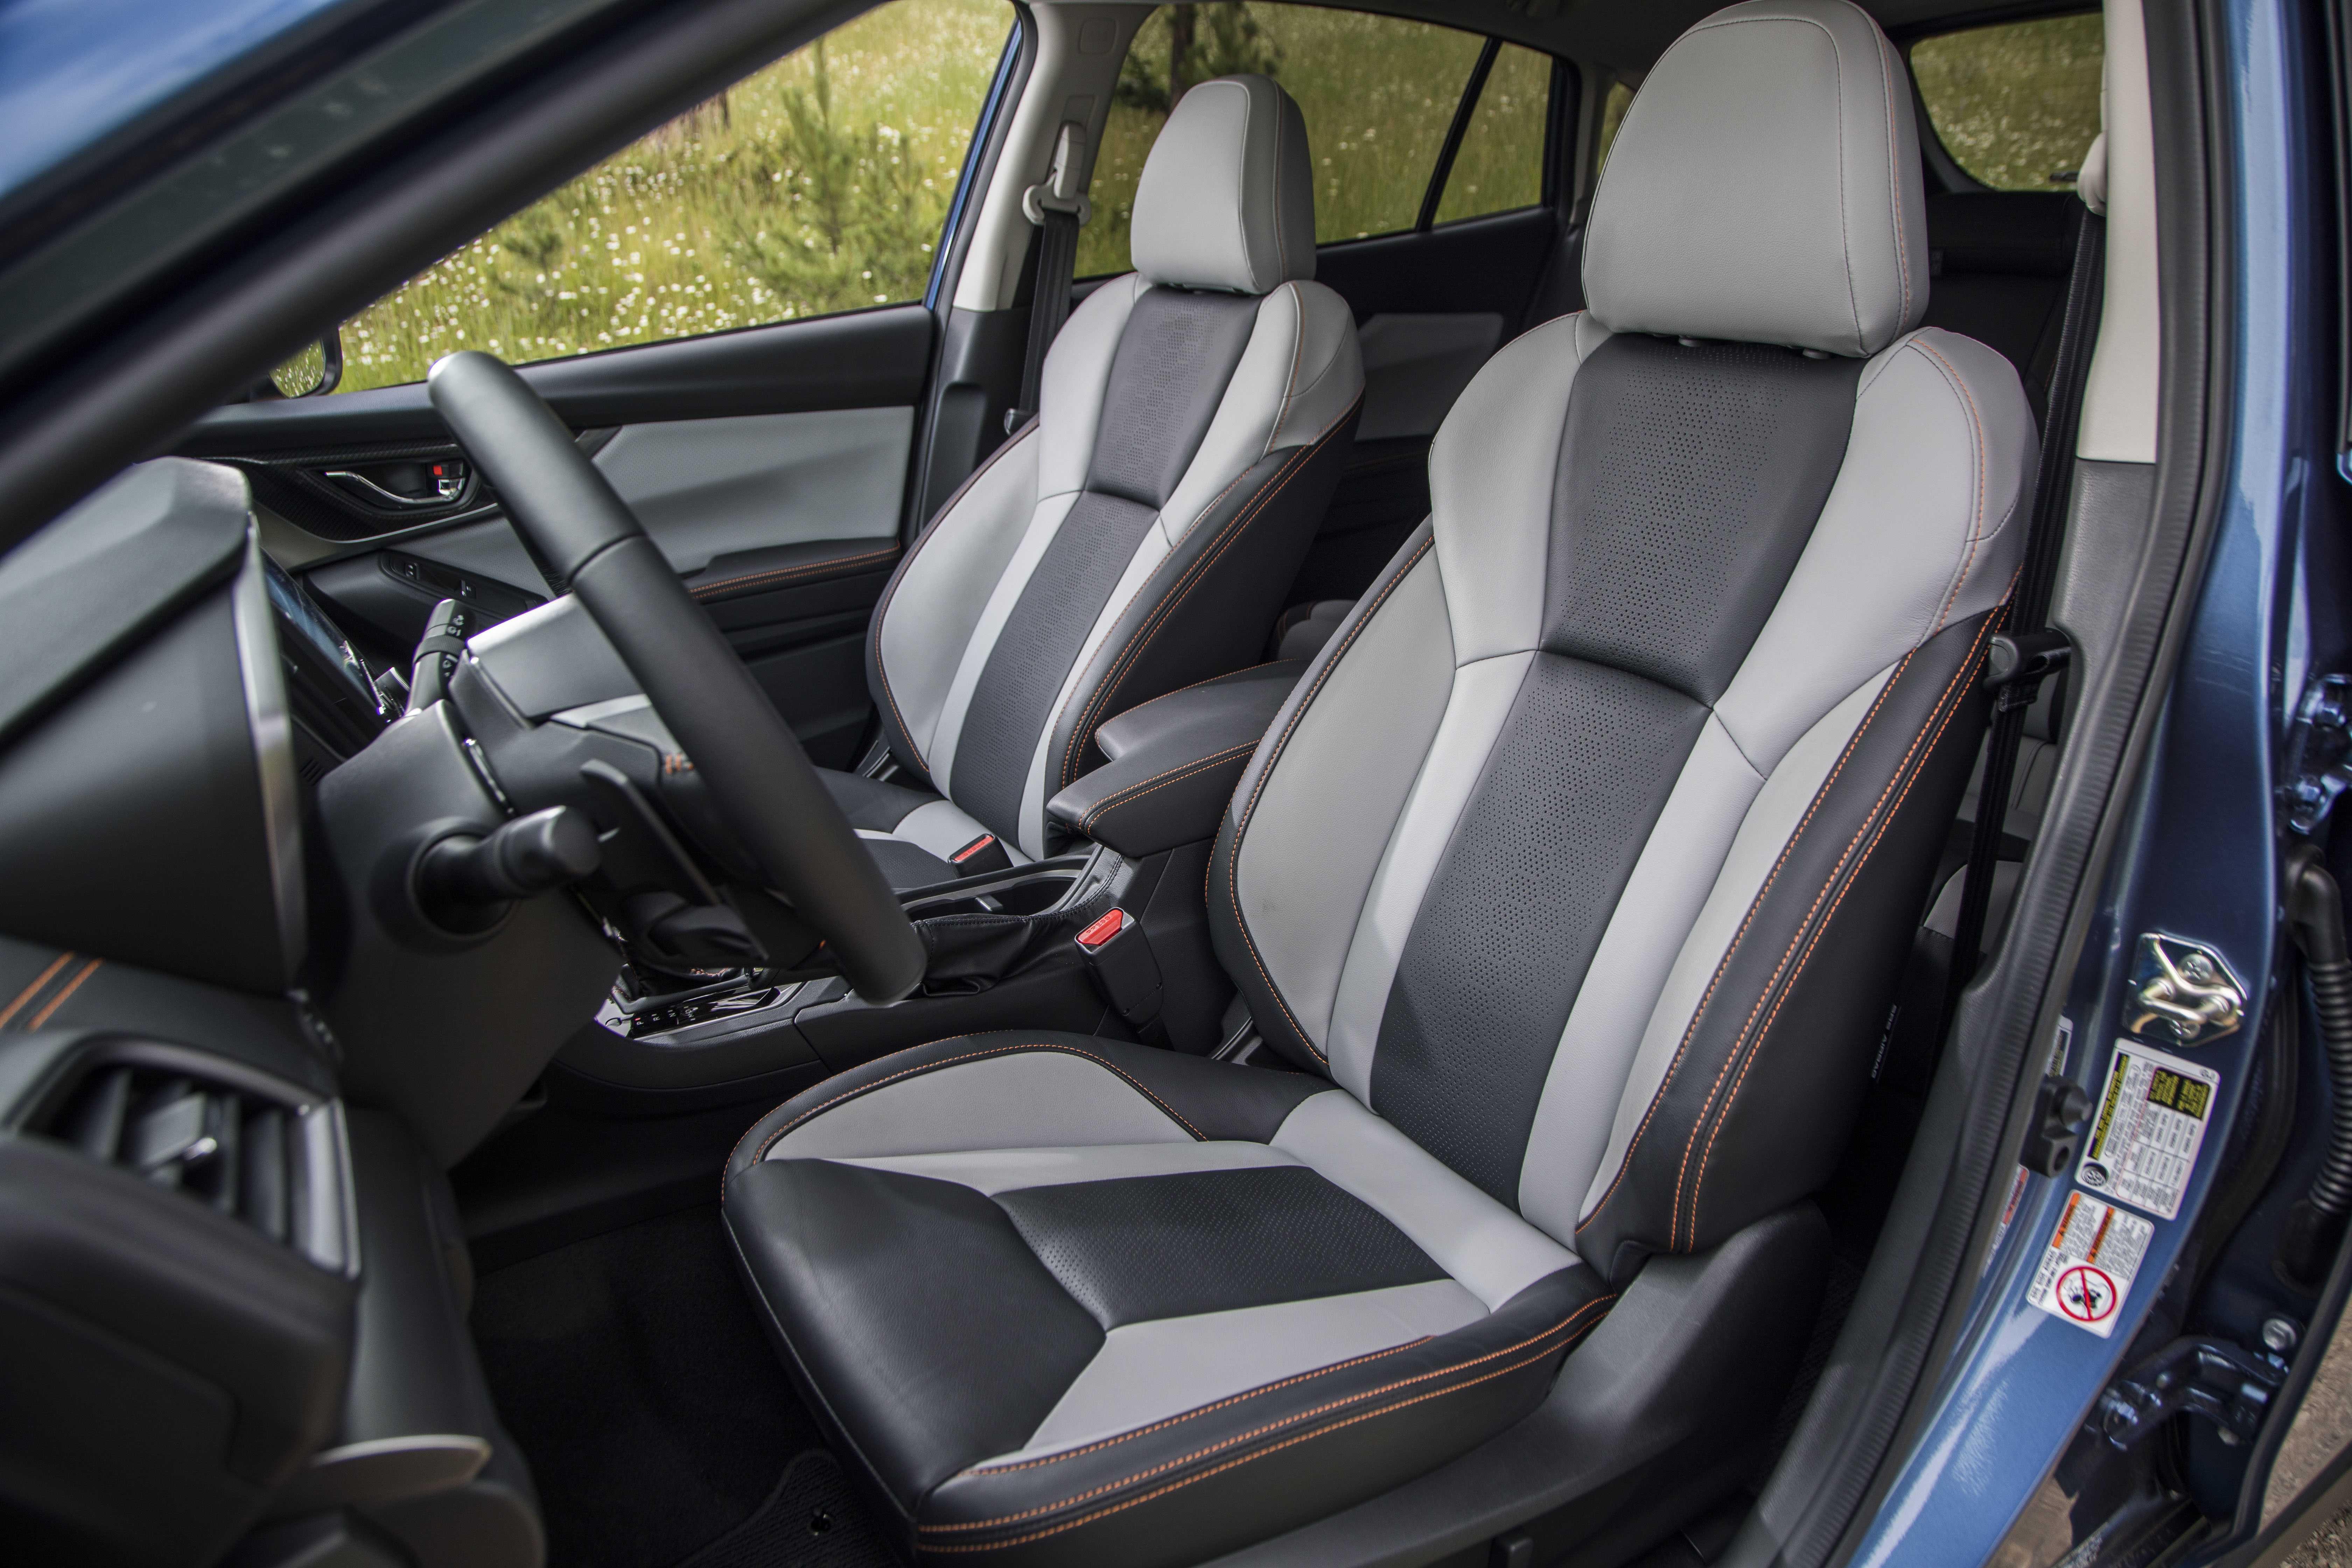 Groovy Subaru Xv Ibusinesslaw Wood Chair Design Ideas Ibusinesslaworg